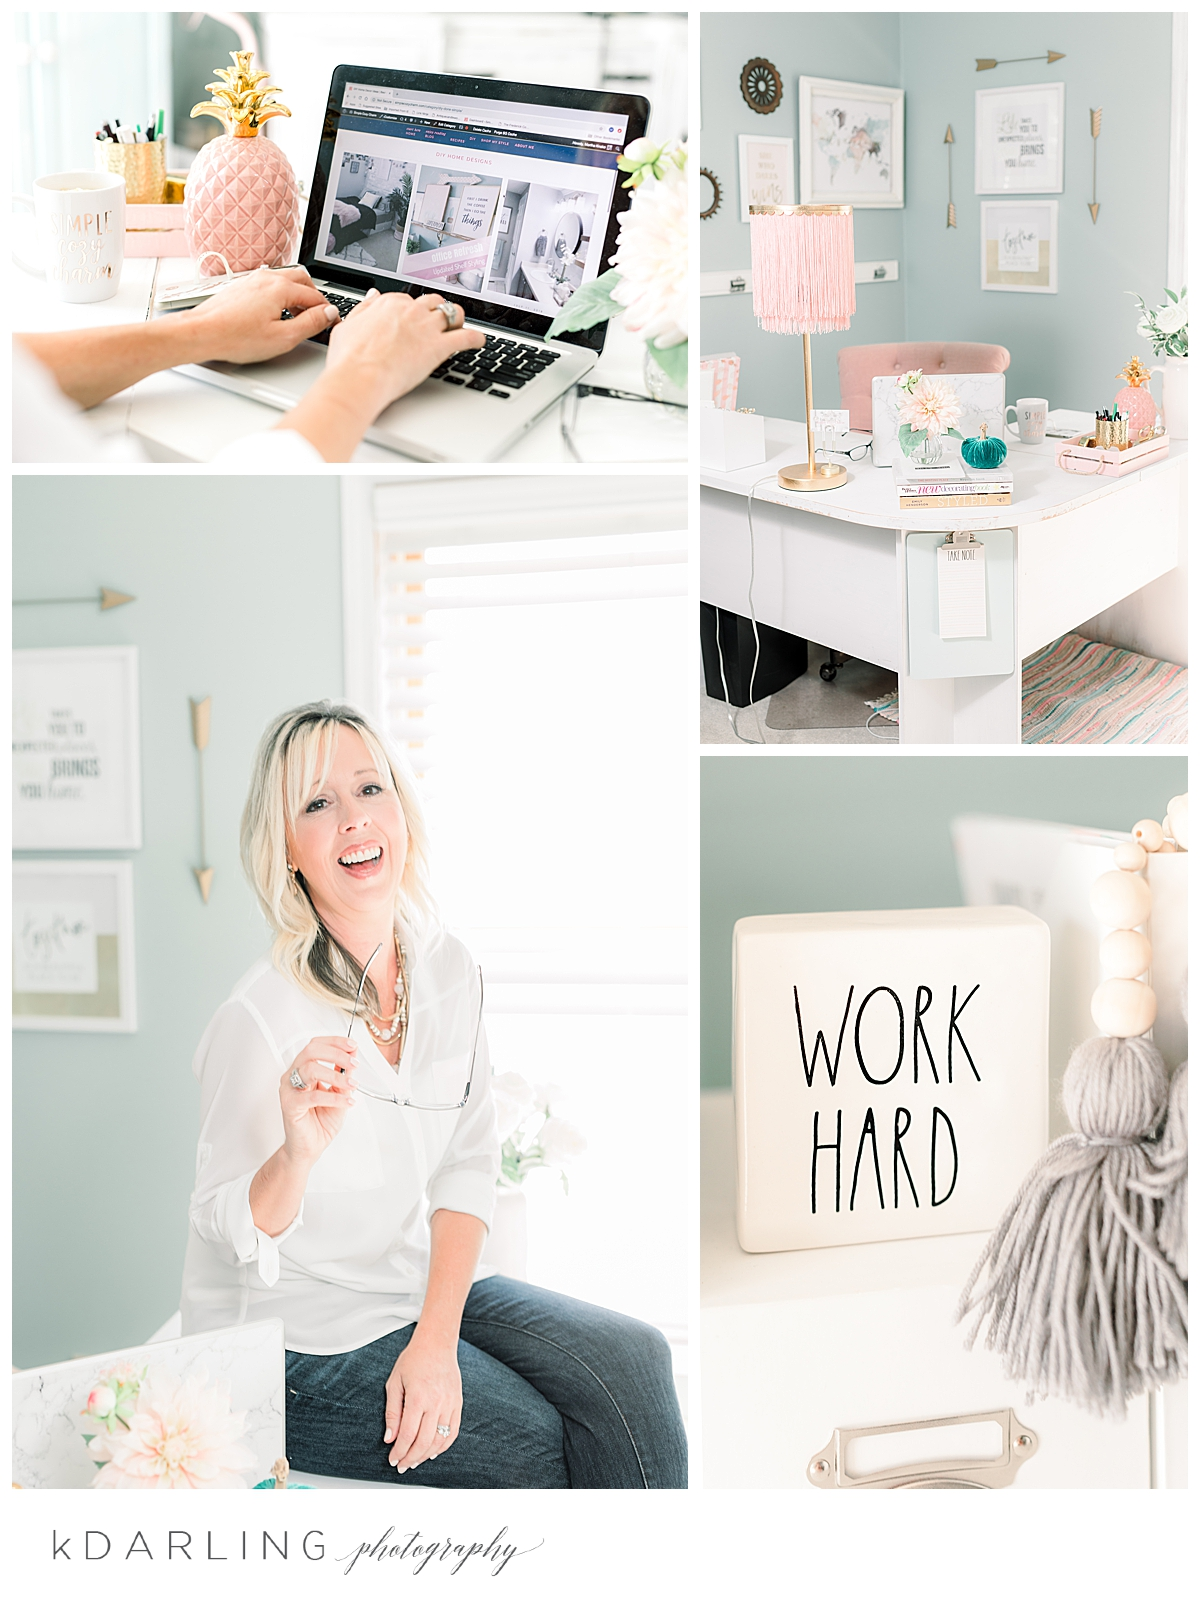 Personal-Branding-Photography-Home-Decorating-Interior-Design-Champaign-Illinois_0004.jpg